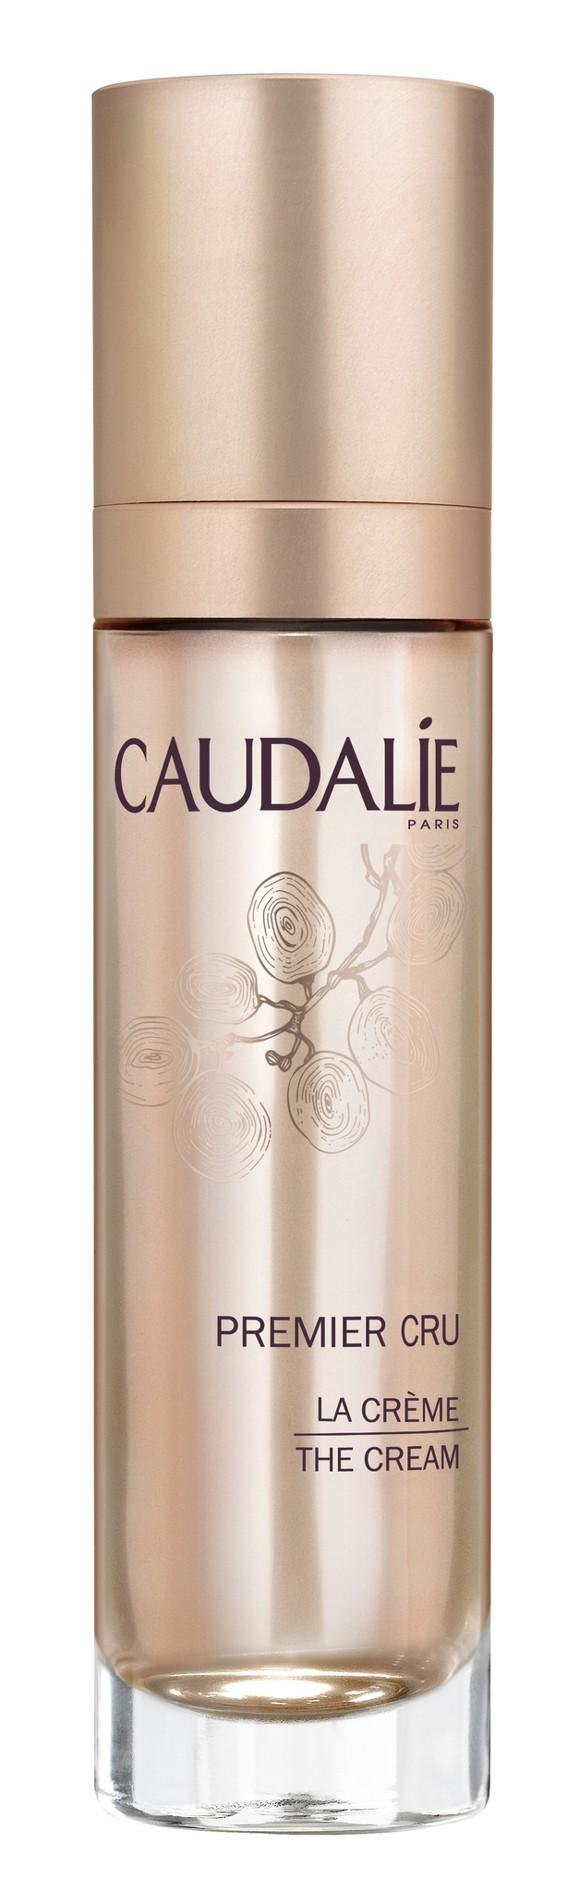 Caudalie - Premier Cru the Cream 50 ml